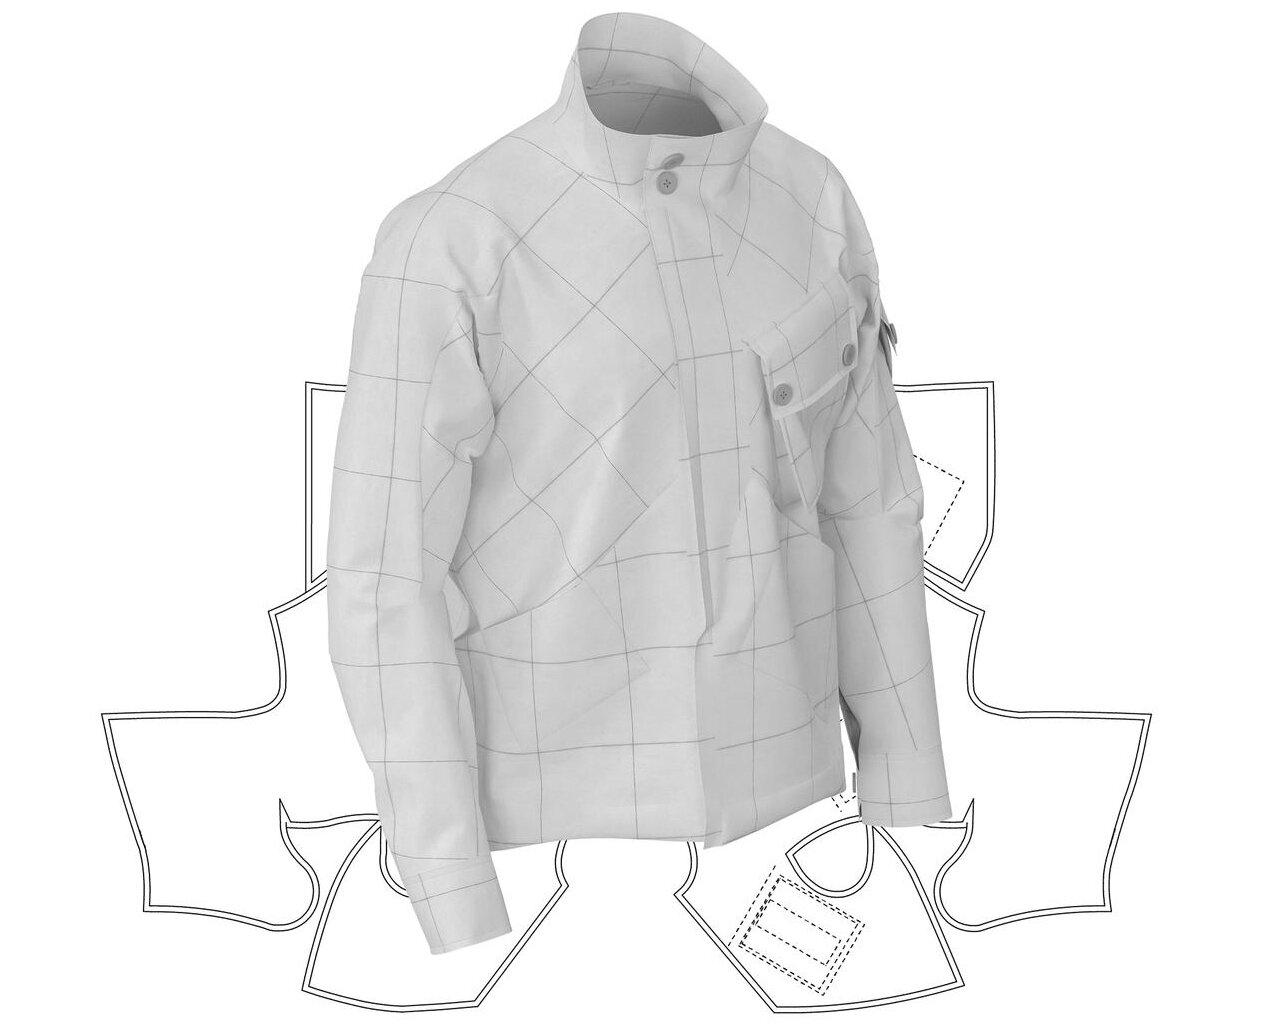 Acatac Pod driver jacket, image    www.atacac.com